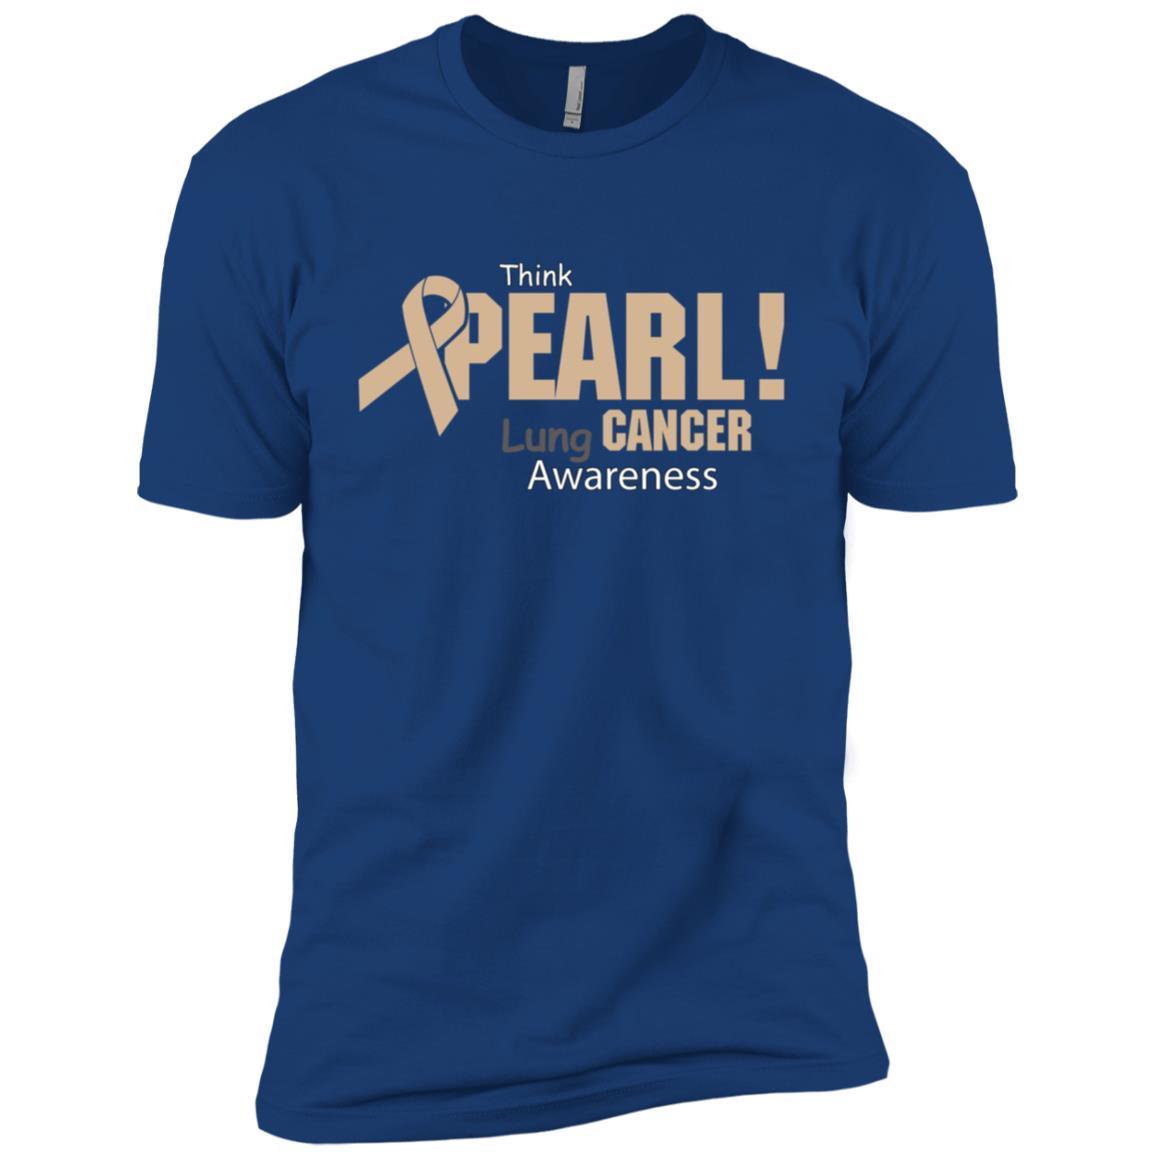 Think Pearl Lung Cancer Awareness Sweater Men Short Sleeve T-Shirt